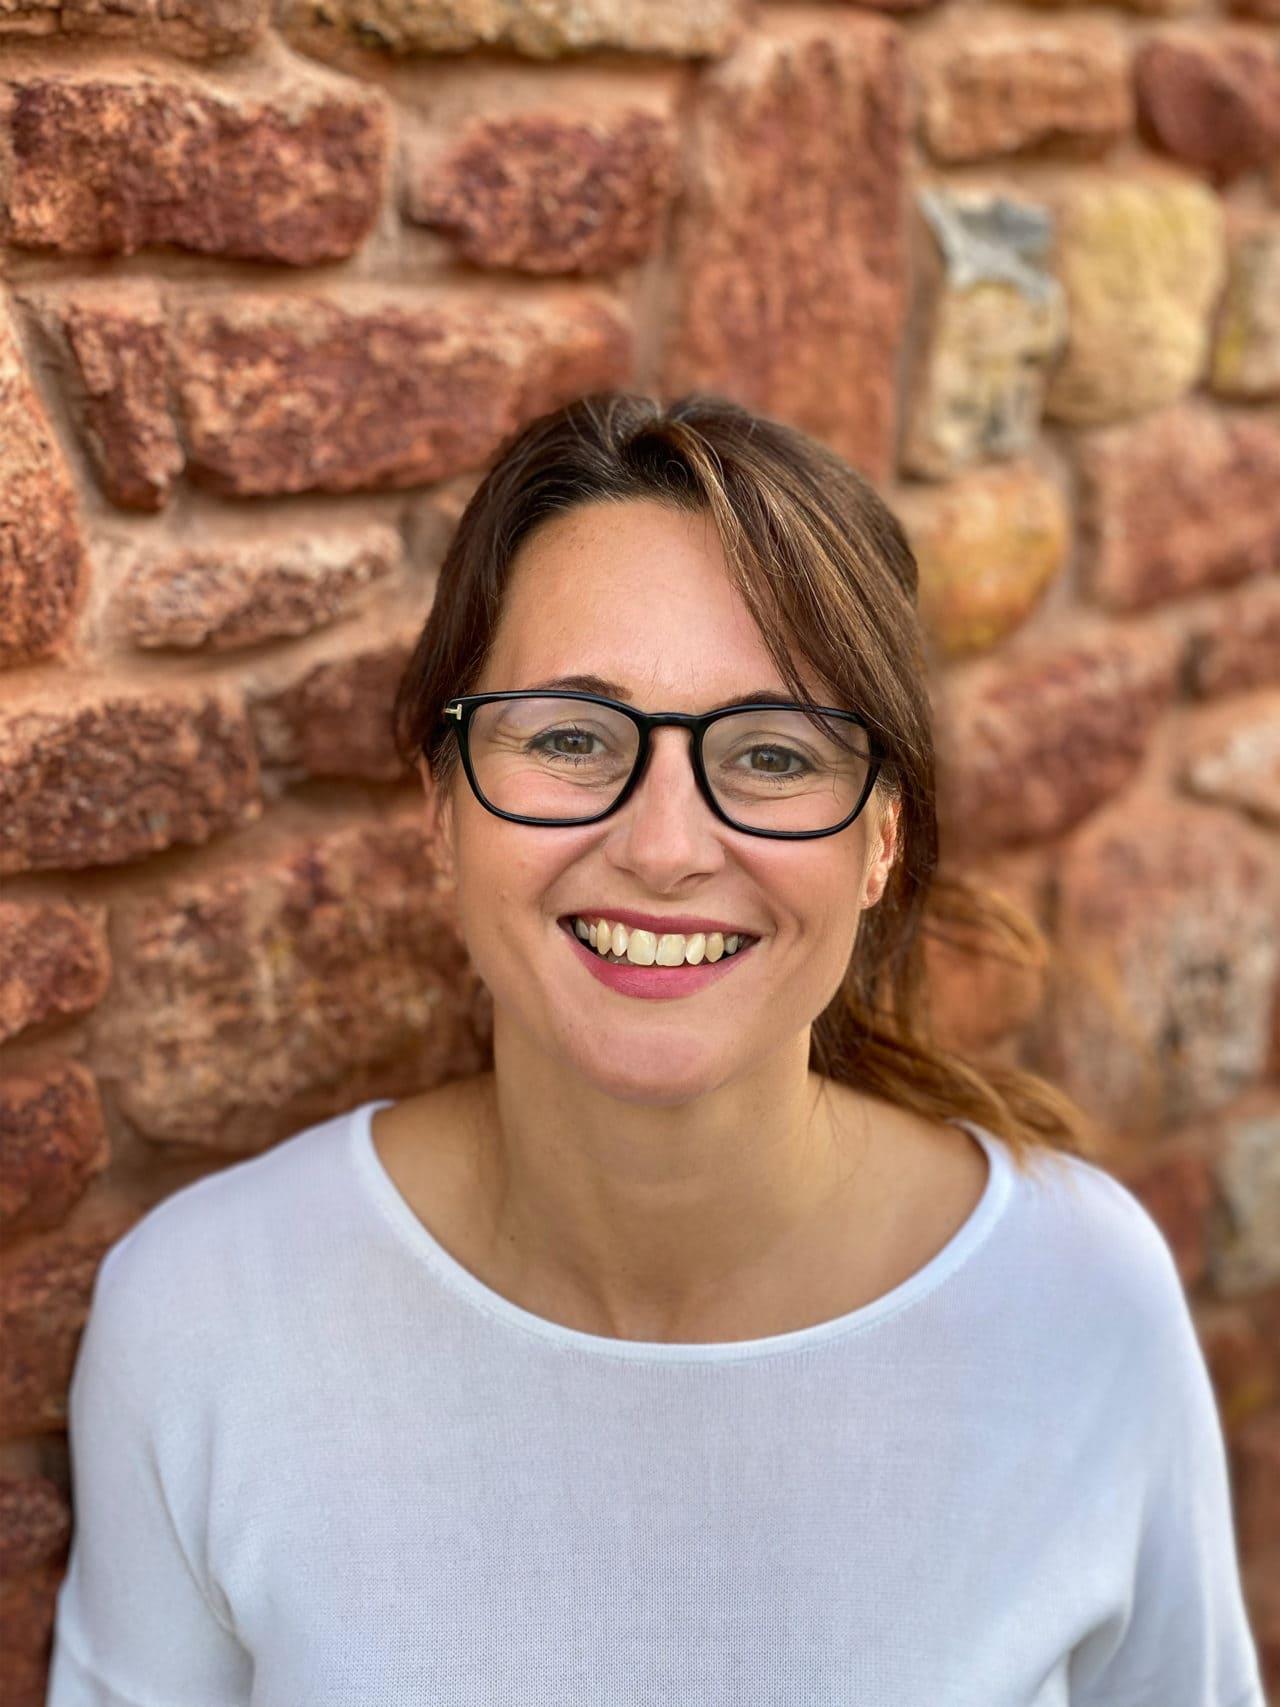 Aimee Shortman Professional Development For Emerging Talent